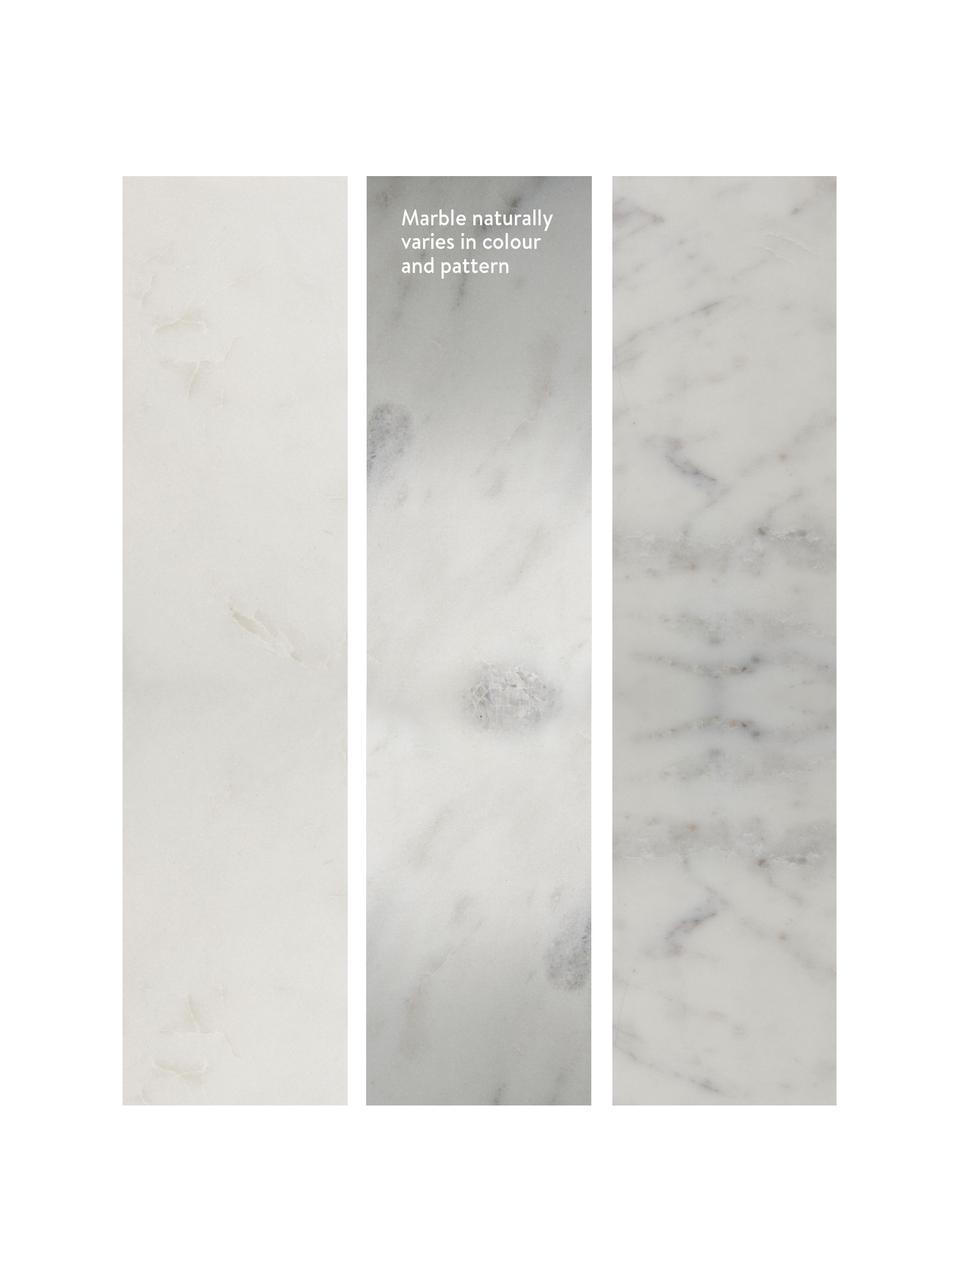 Ronde marmeren bijzettafel Alys, Tafelblad: marmer, Frame: gecoat metaal, Tafelblad: wit-grijs marmer. Frame: glanzend goudkleurig, Ø 40 x H 50 cm